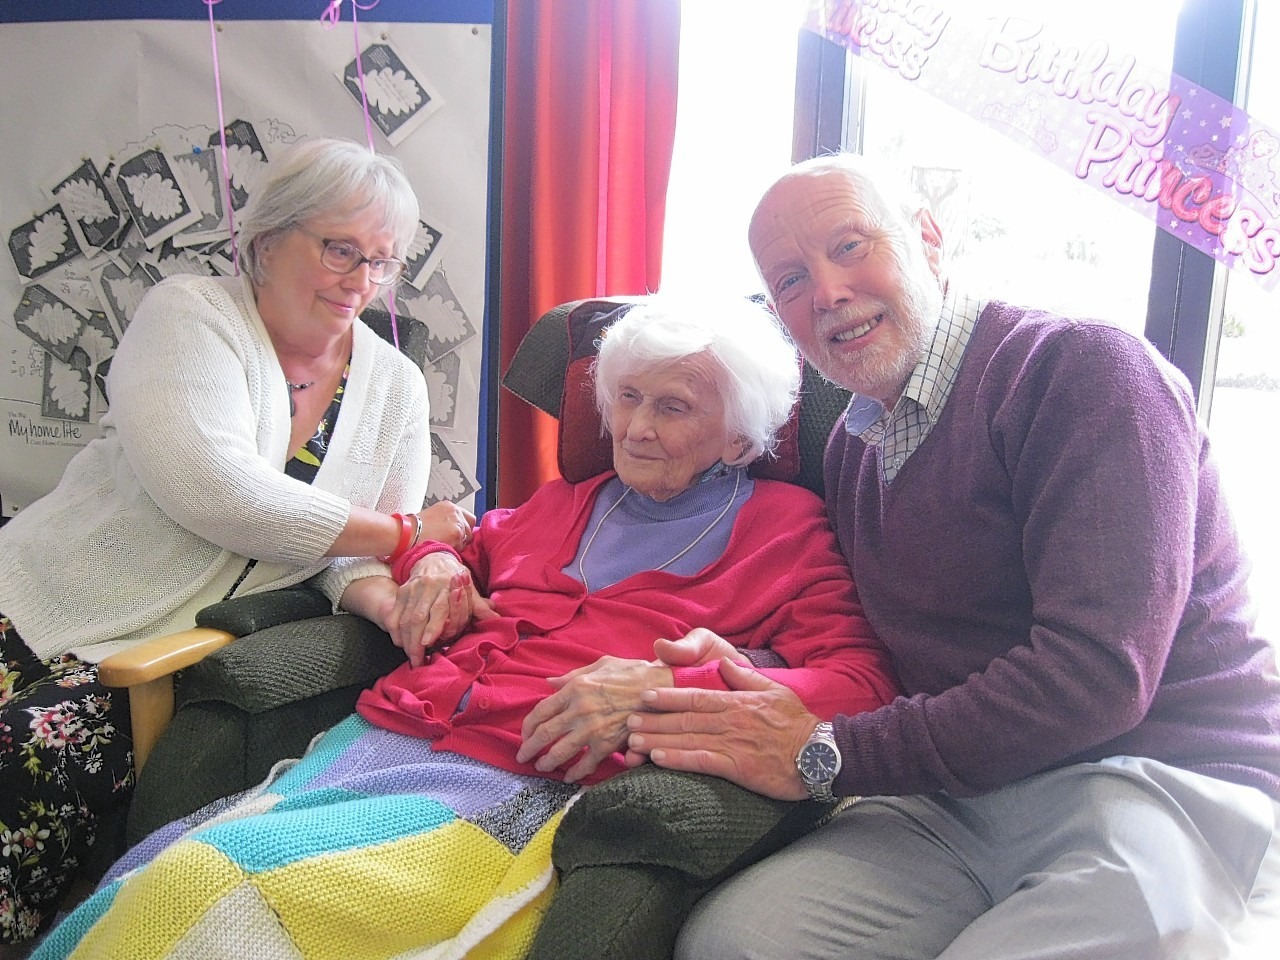 Irene Chapman celebrates her 109th birthday with family